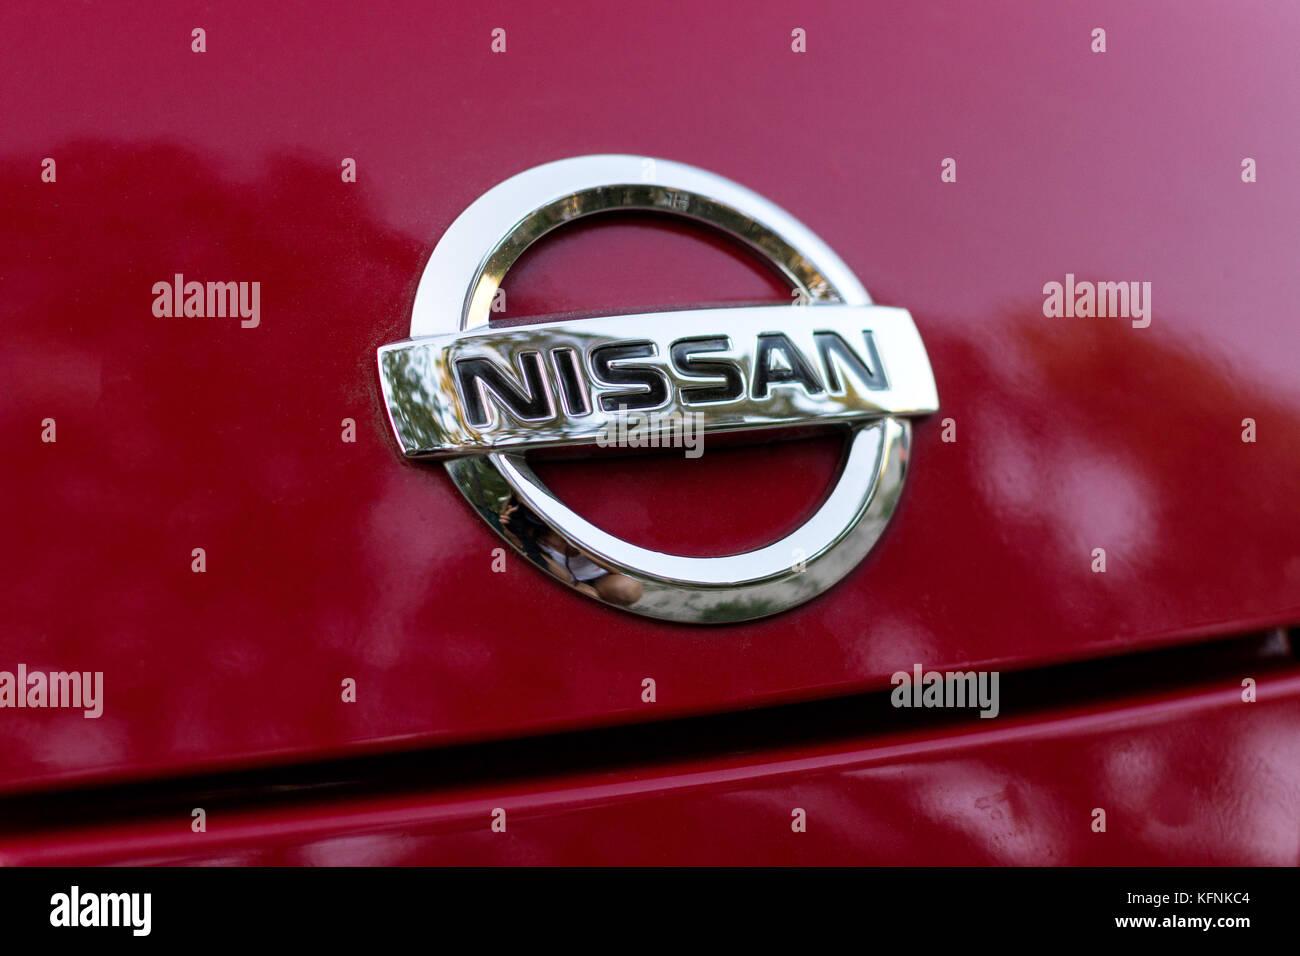 DNIPRO, UKRAINE - AUGUST 10, 2013: NISSAN CAR LOGOTYPE CLOSE - Stock Image